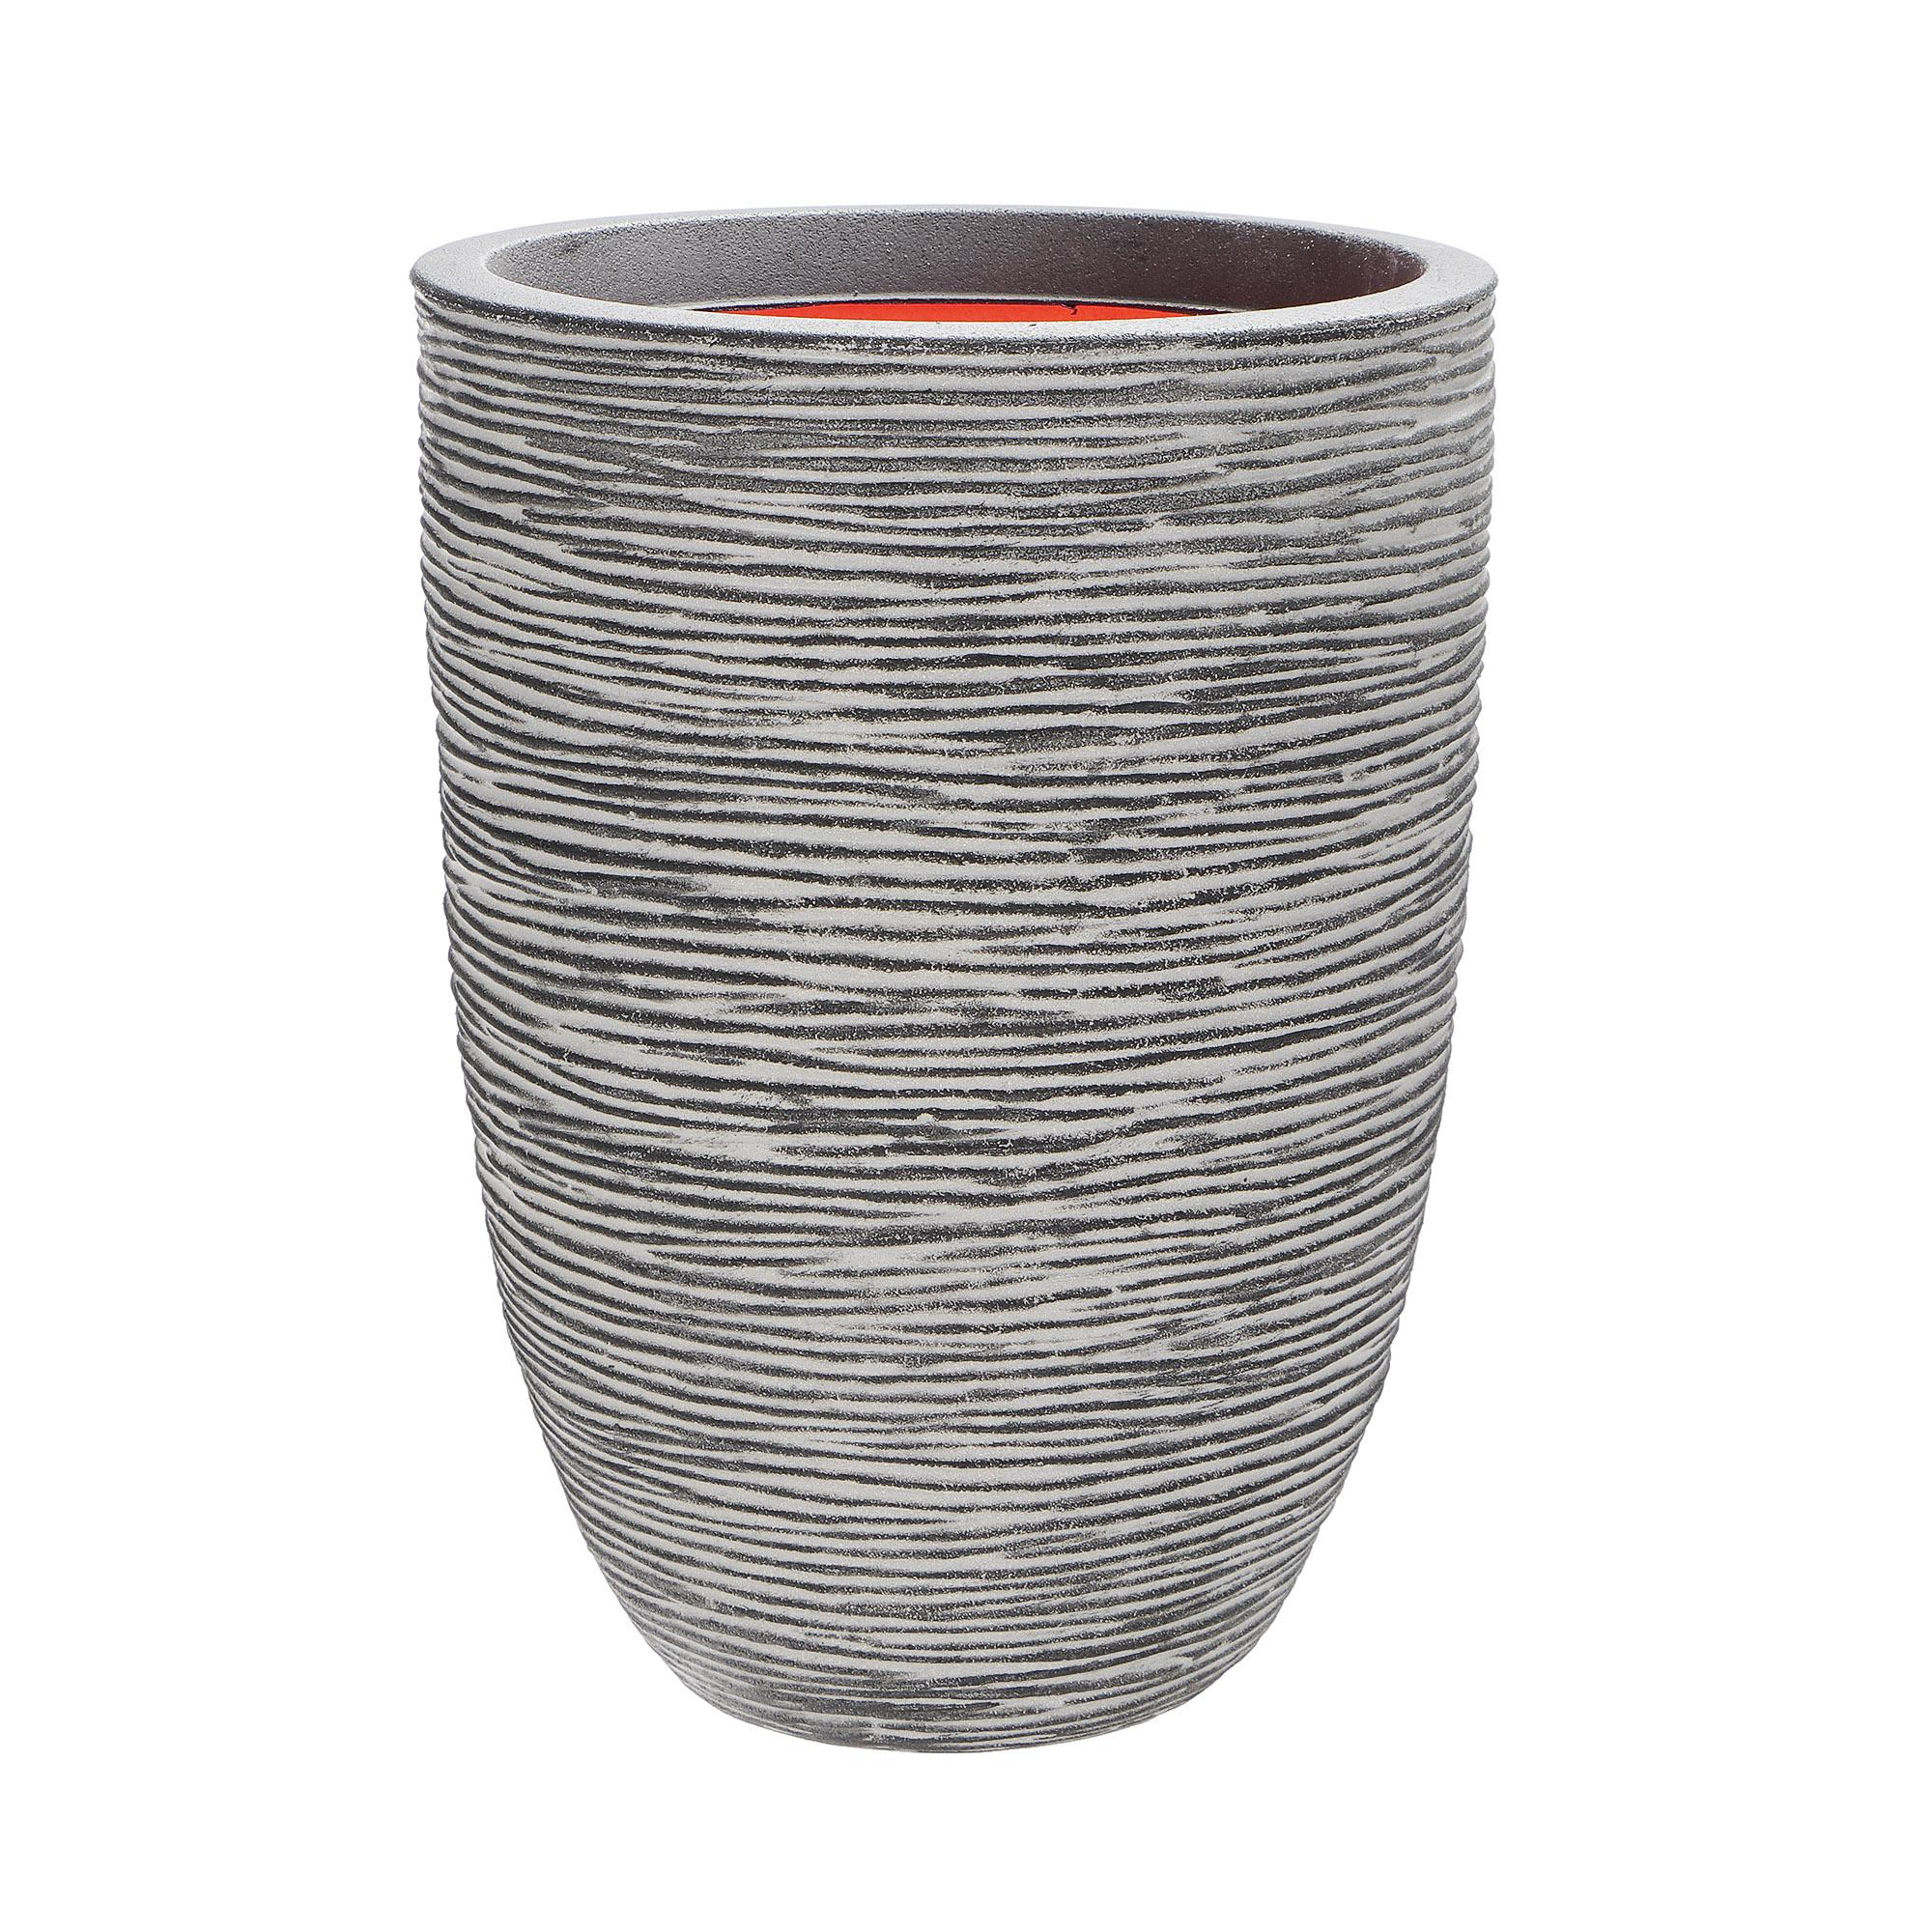 Кашпо Capi Tutch Vase Elegant антрацит 36х47 см